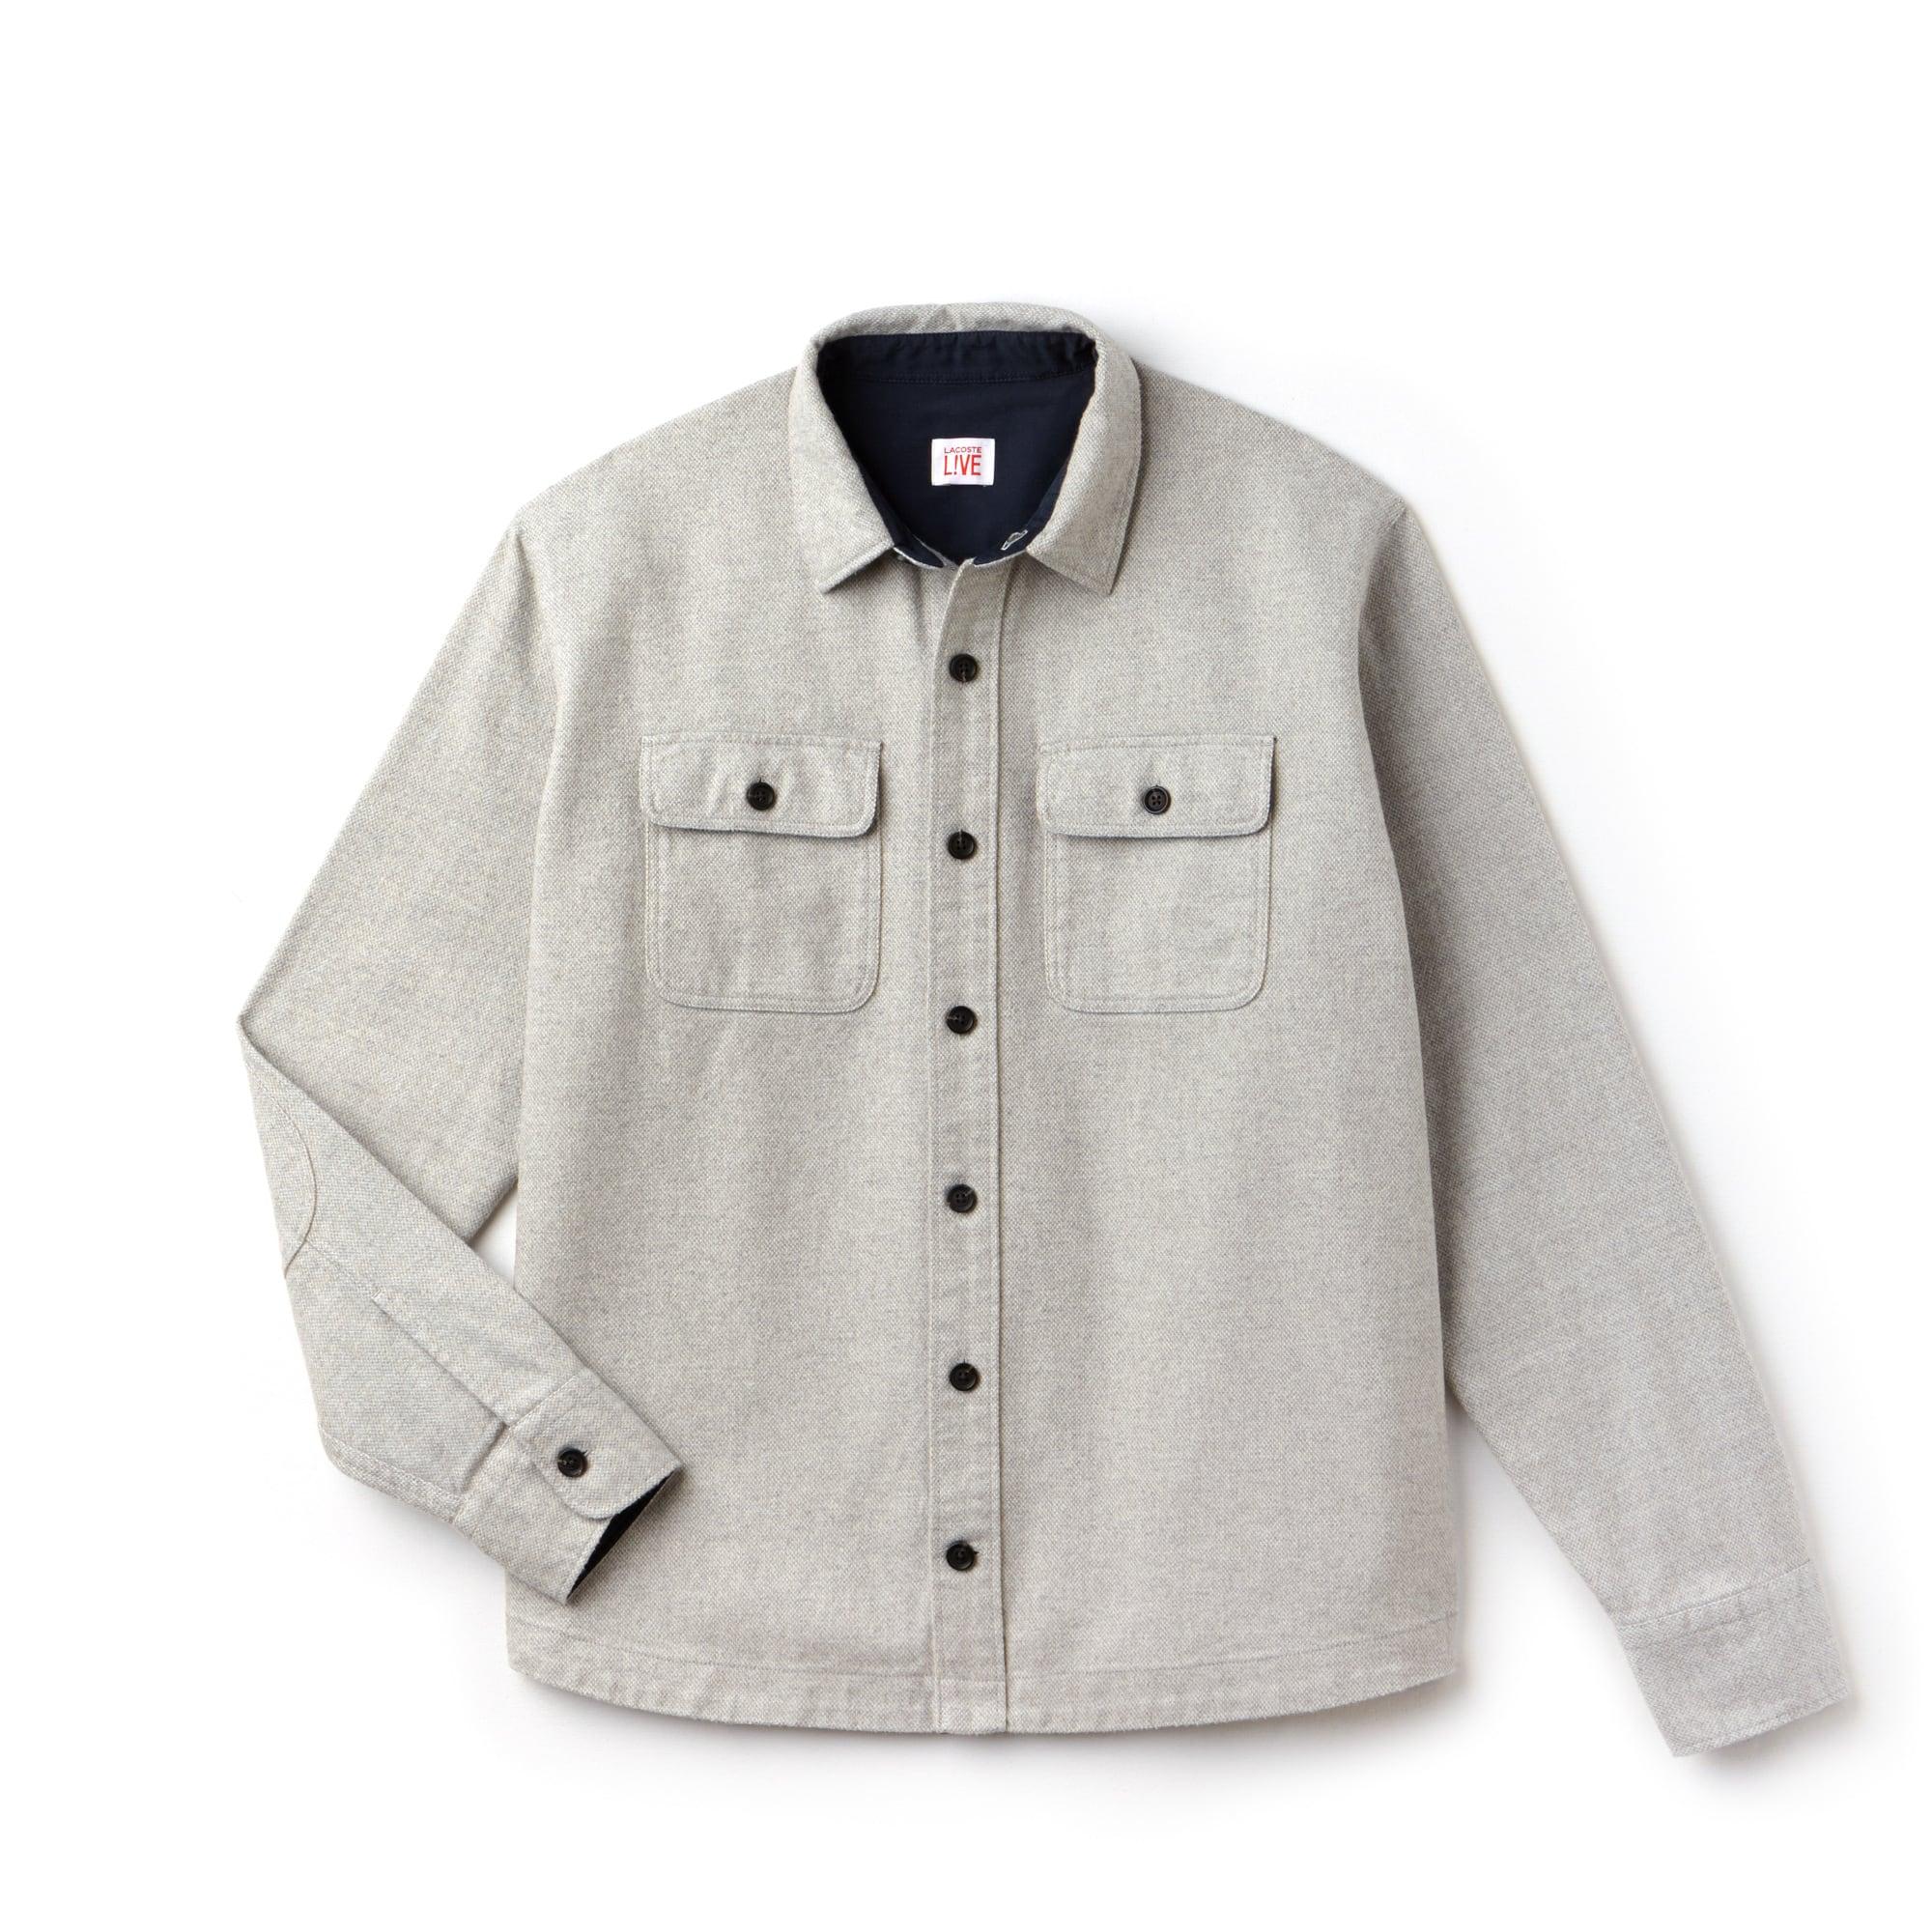 Boxy Fit Herren-Hemd aus Baumwollflanell LACOSTE L!VE